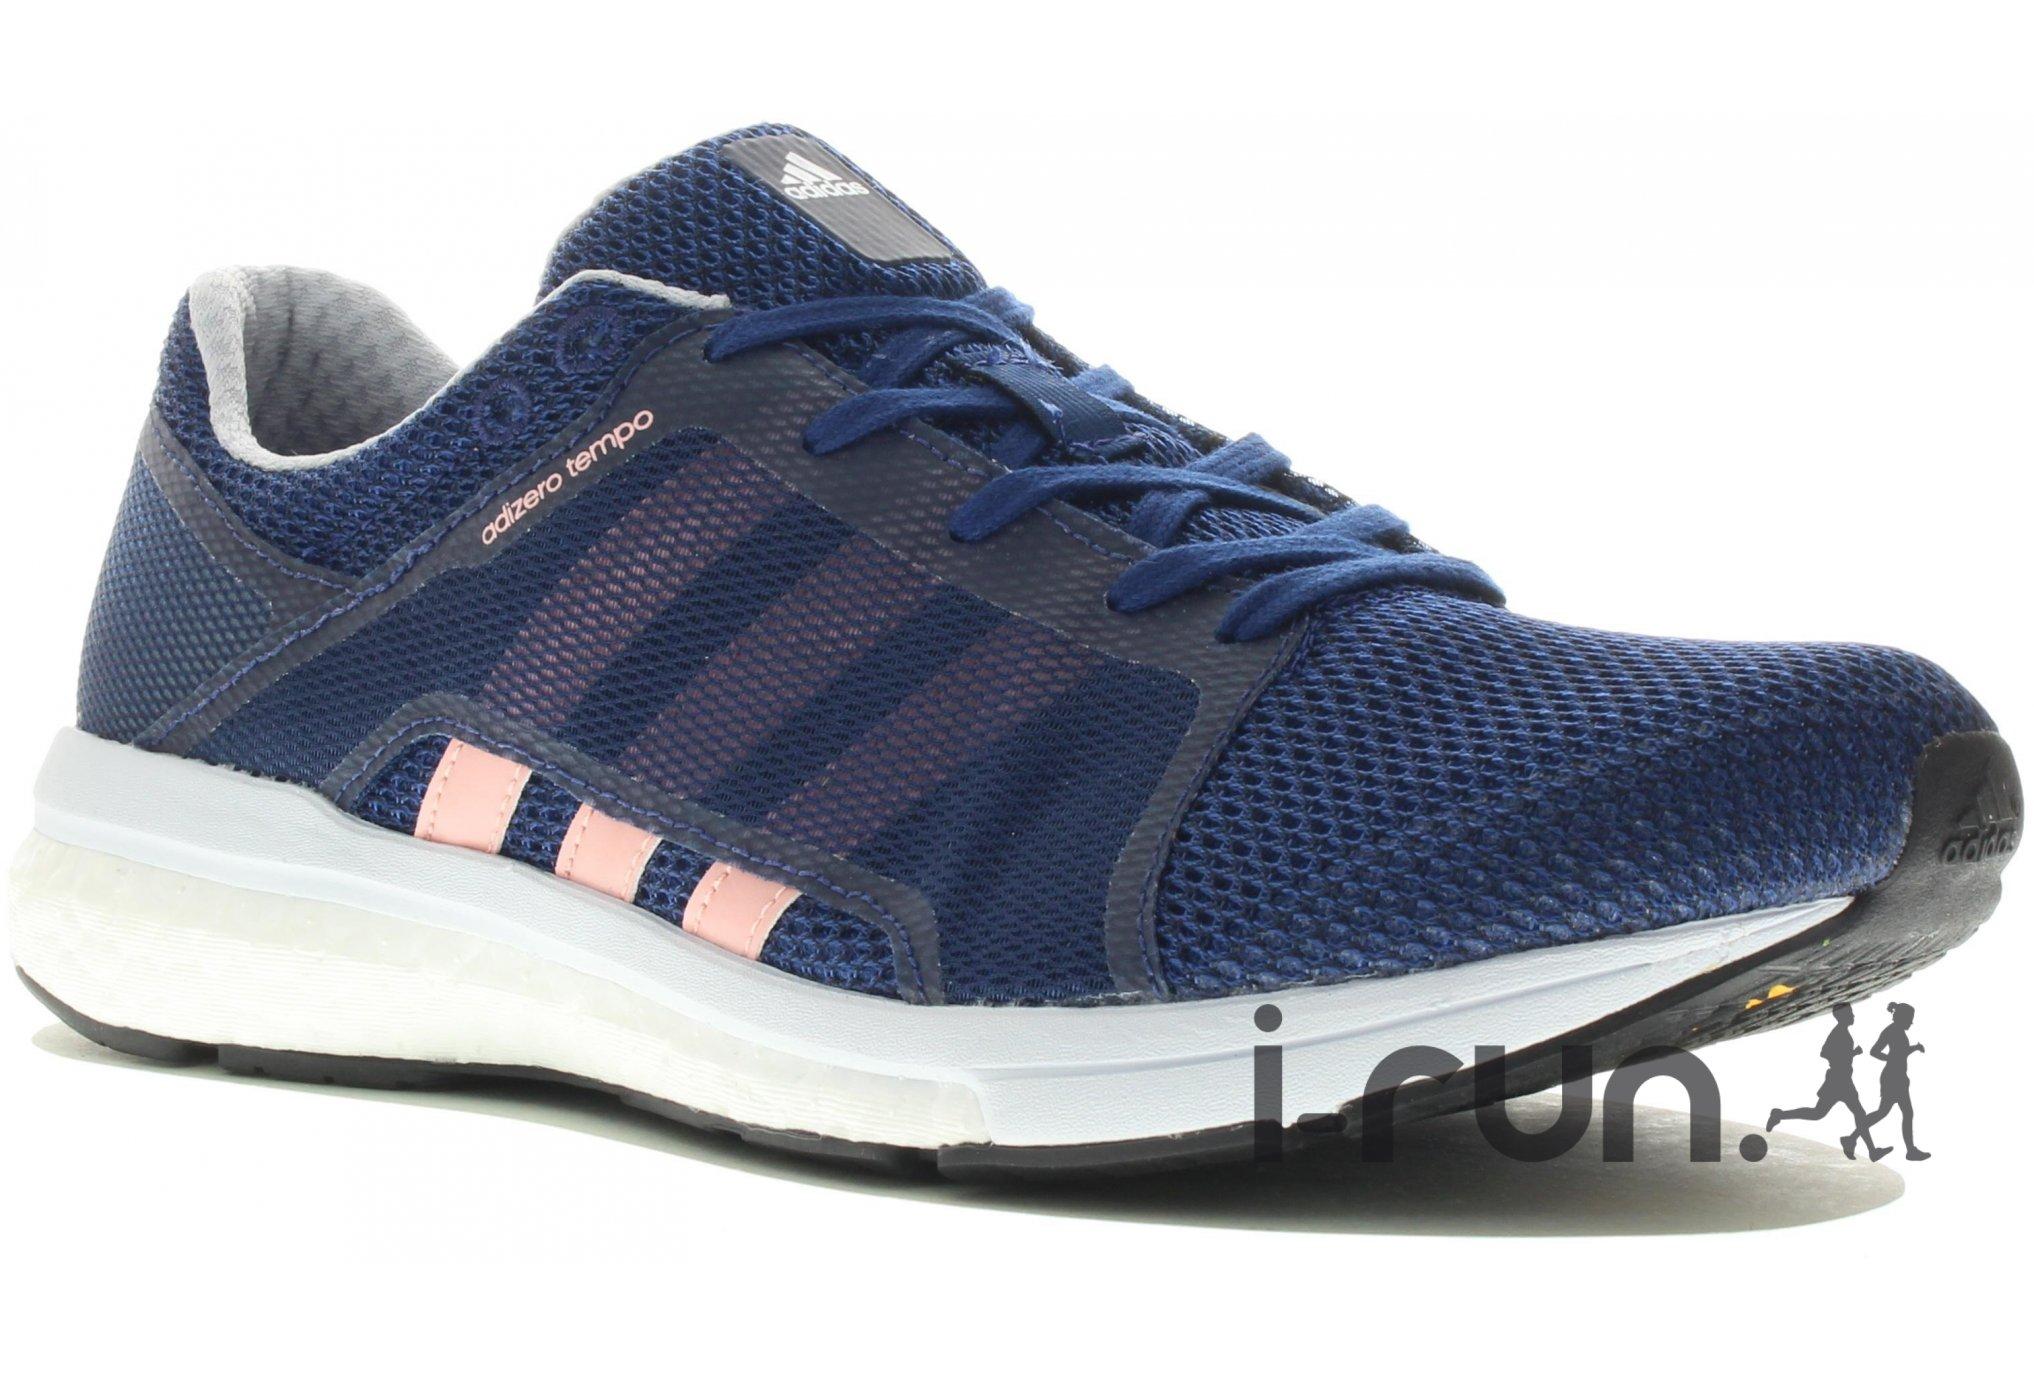 Adidas Adizero tempo 8 w chaussures running femme